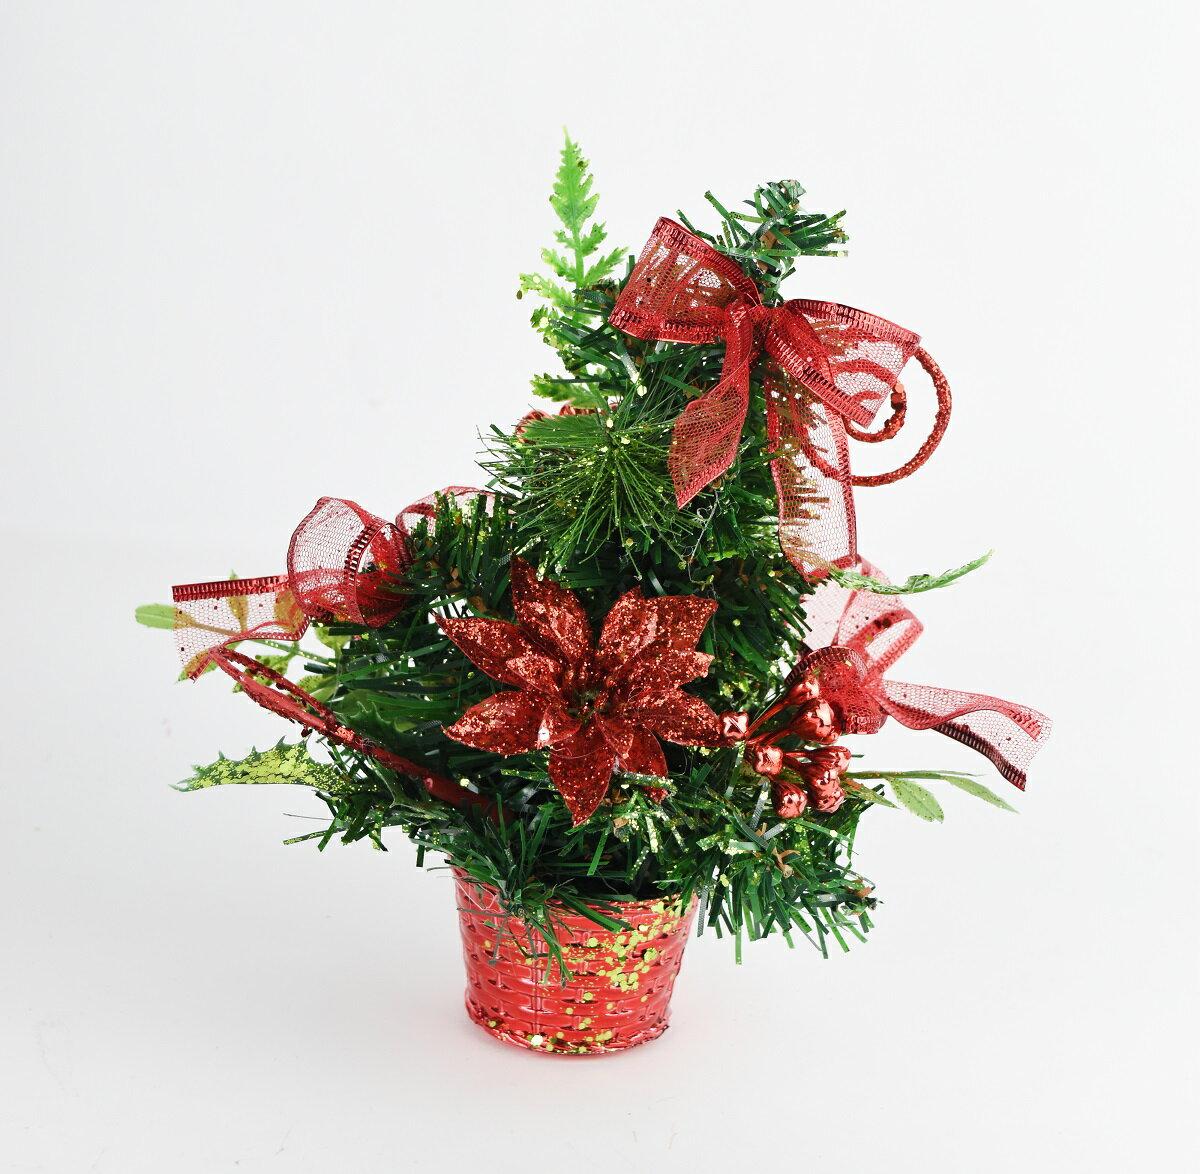 X射線【X454035】20cm裝飾聖誕樹(紅),聖誕樹/聖誕佈置/聖誕燈/會場佈置/材料包/成品樹/小樹